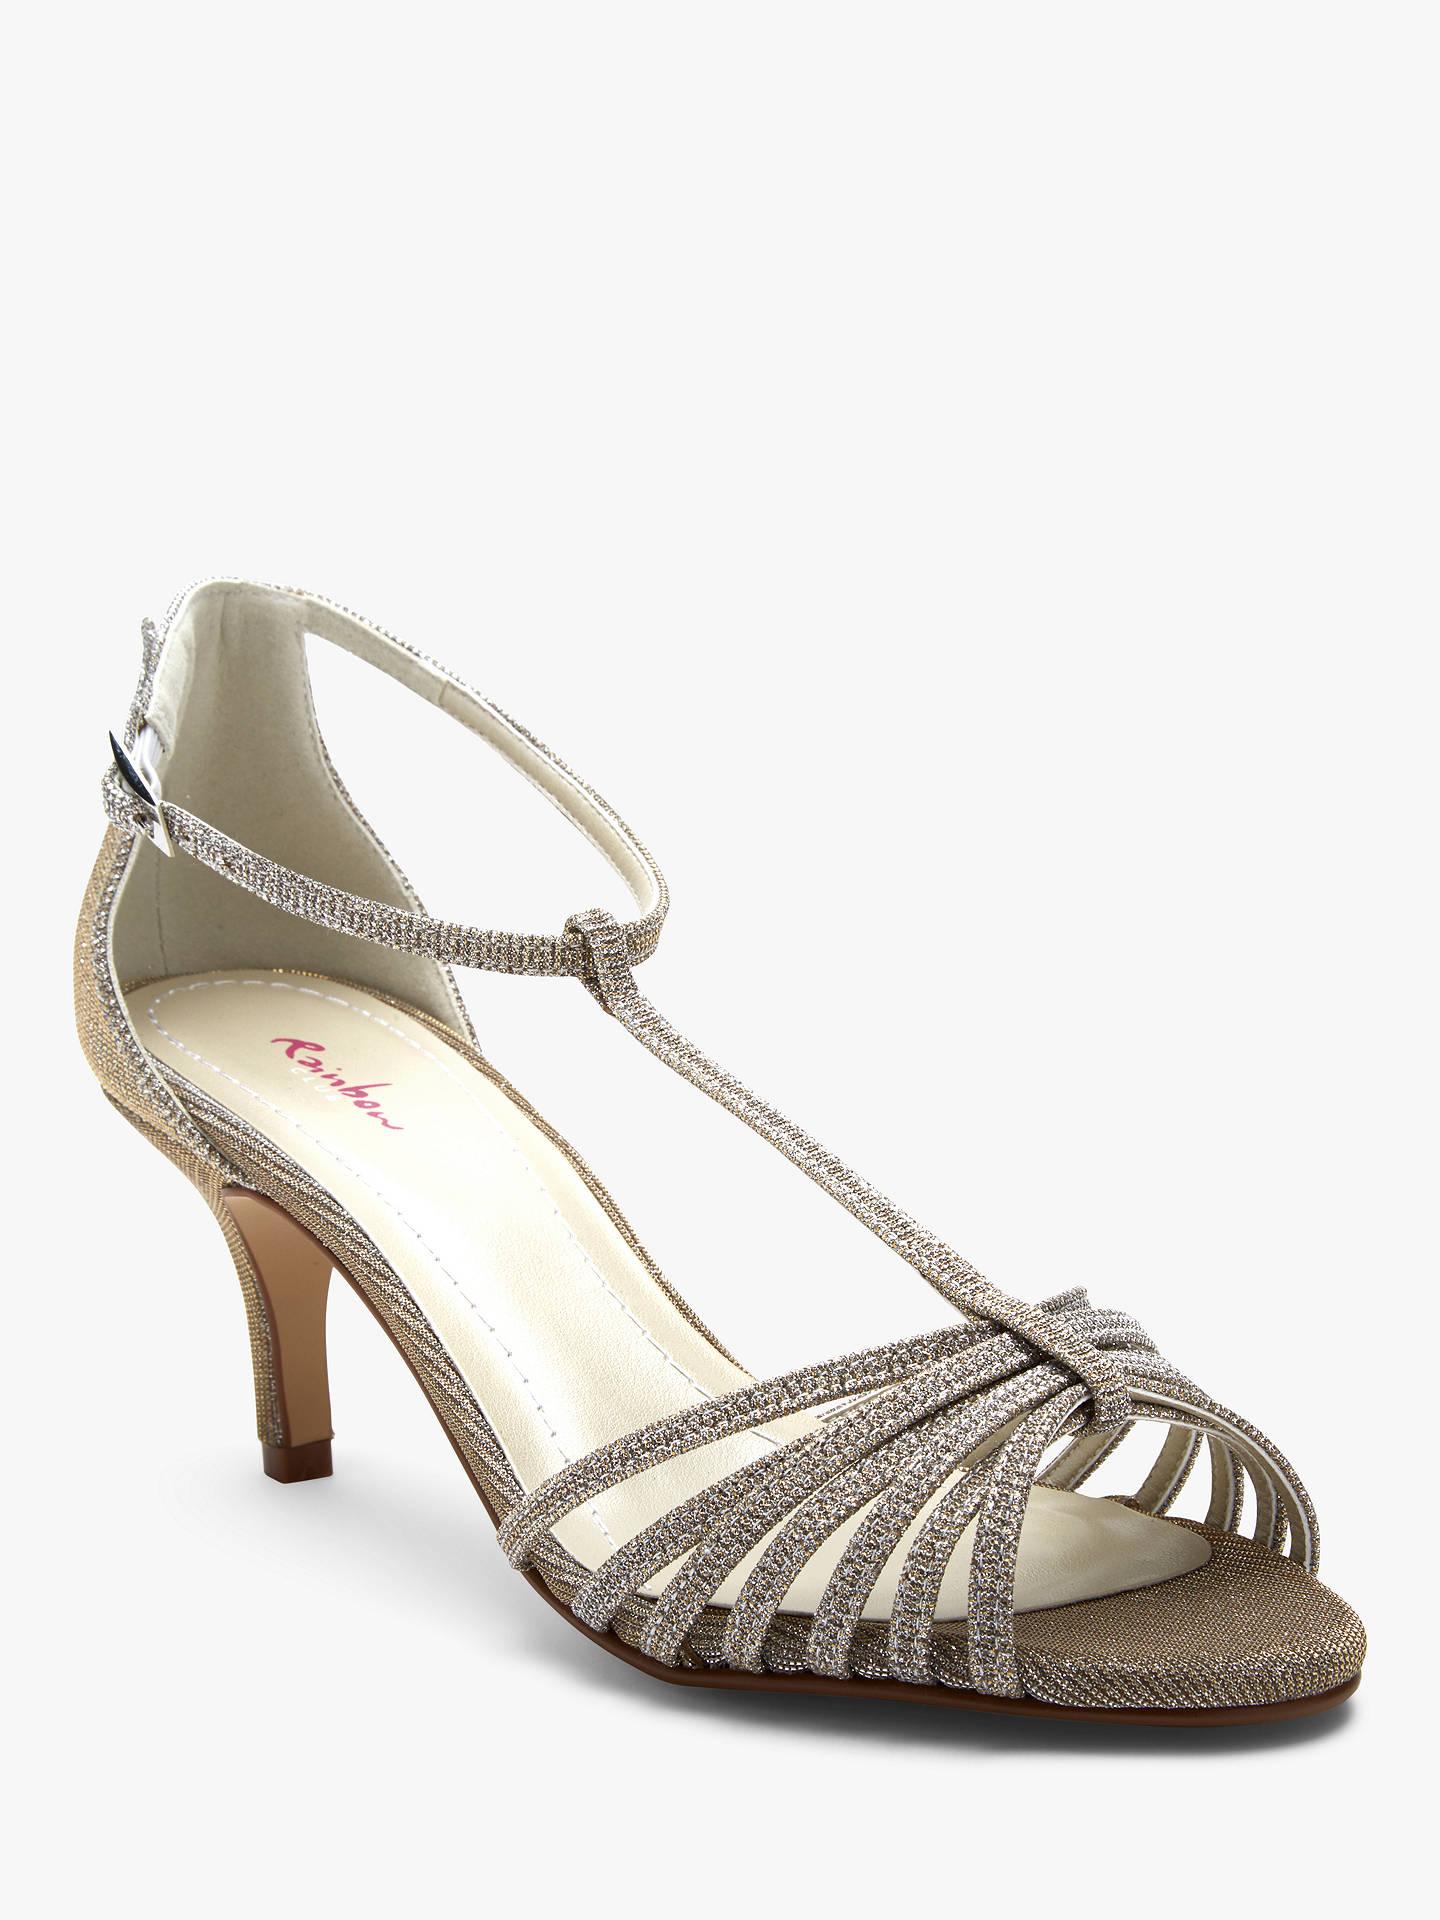 4ddecfac922 ... Buy Rainbow Club Estelle Stiletto Heeled Sandals